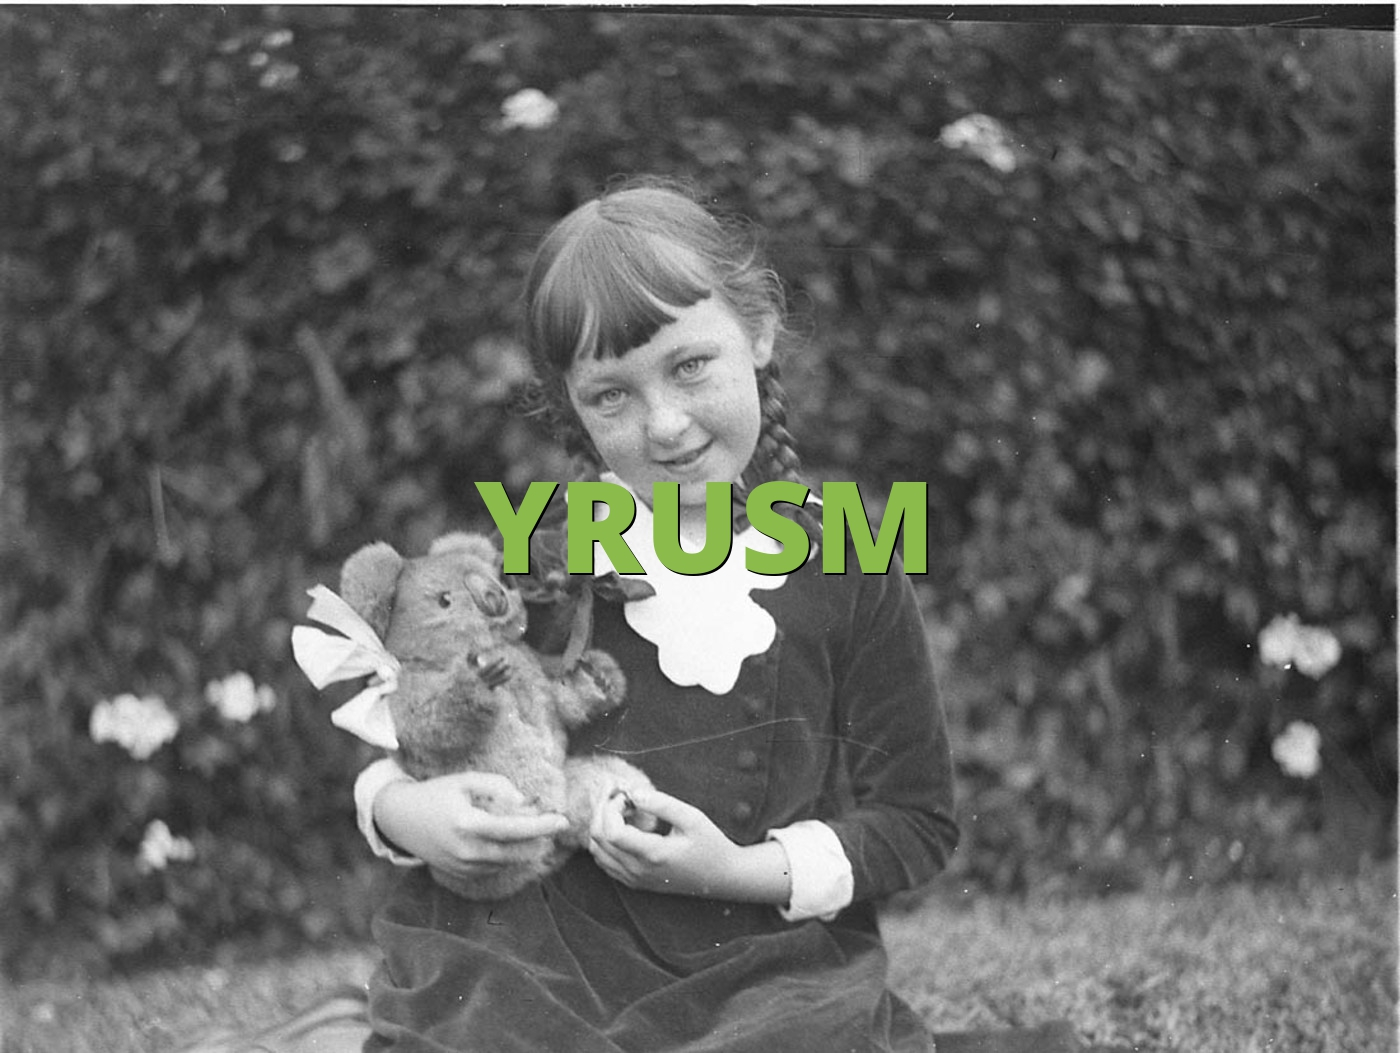 YRUSM